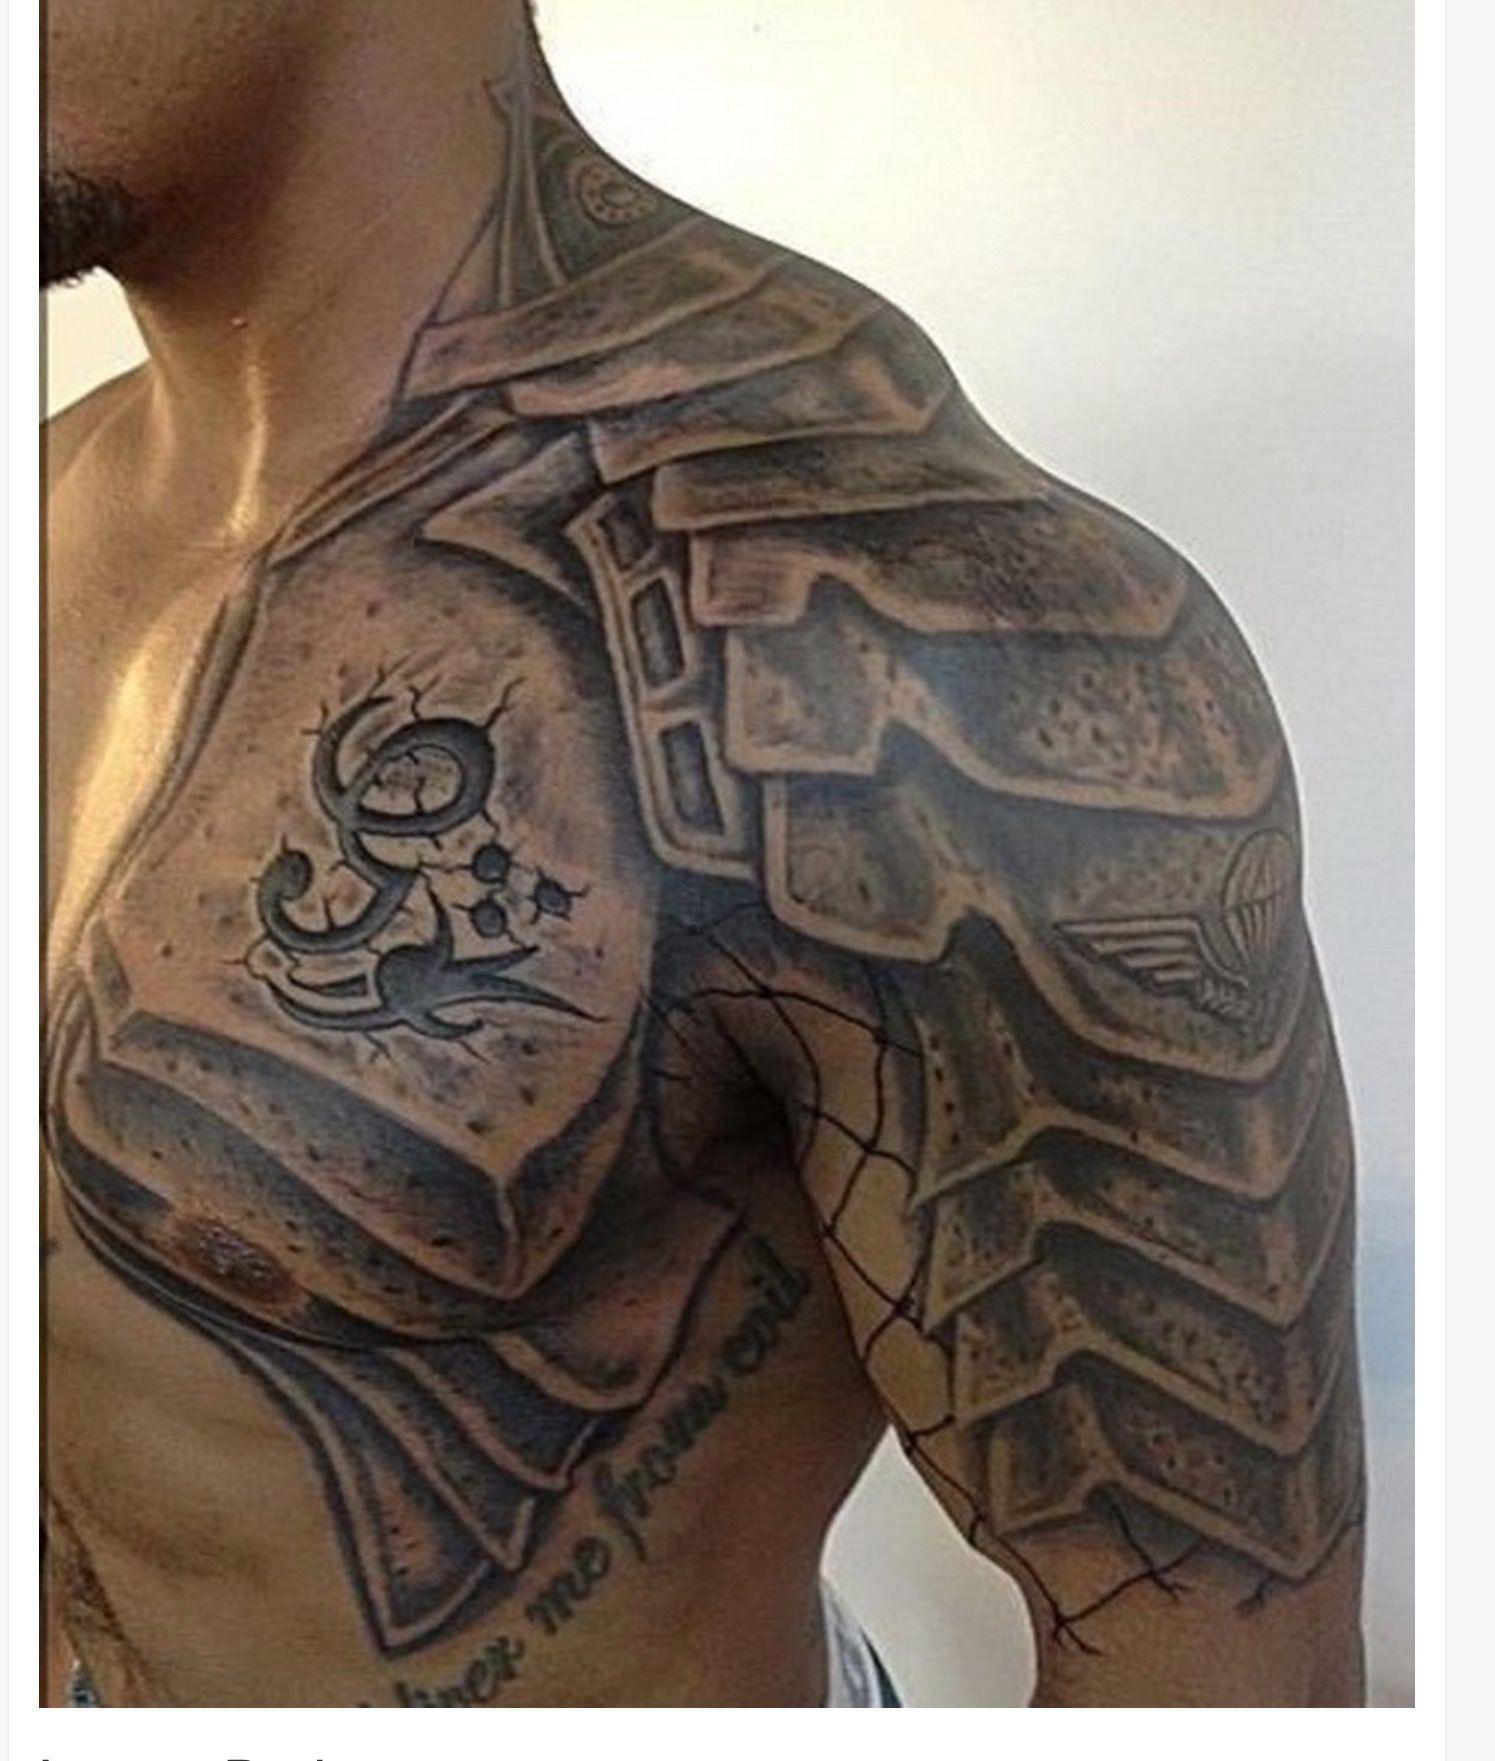 Pin by Nathanael Dardon on Tattoo Shoulder armor tattoo